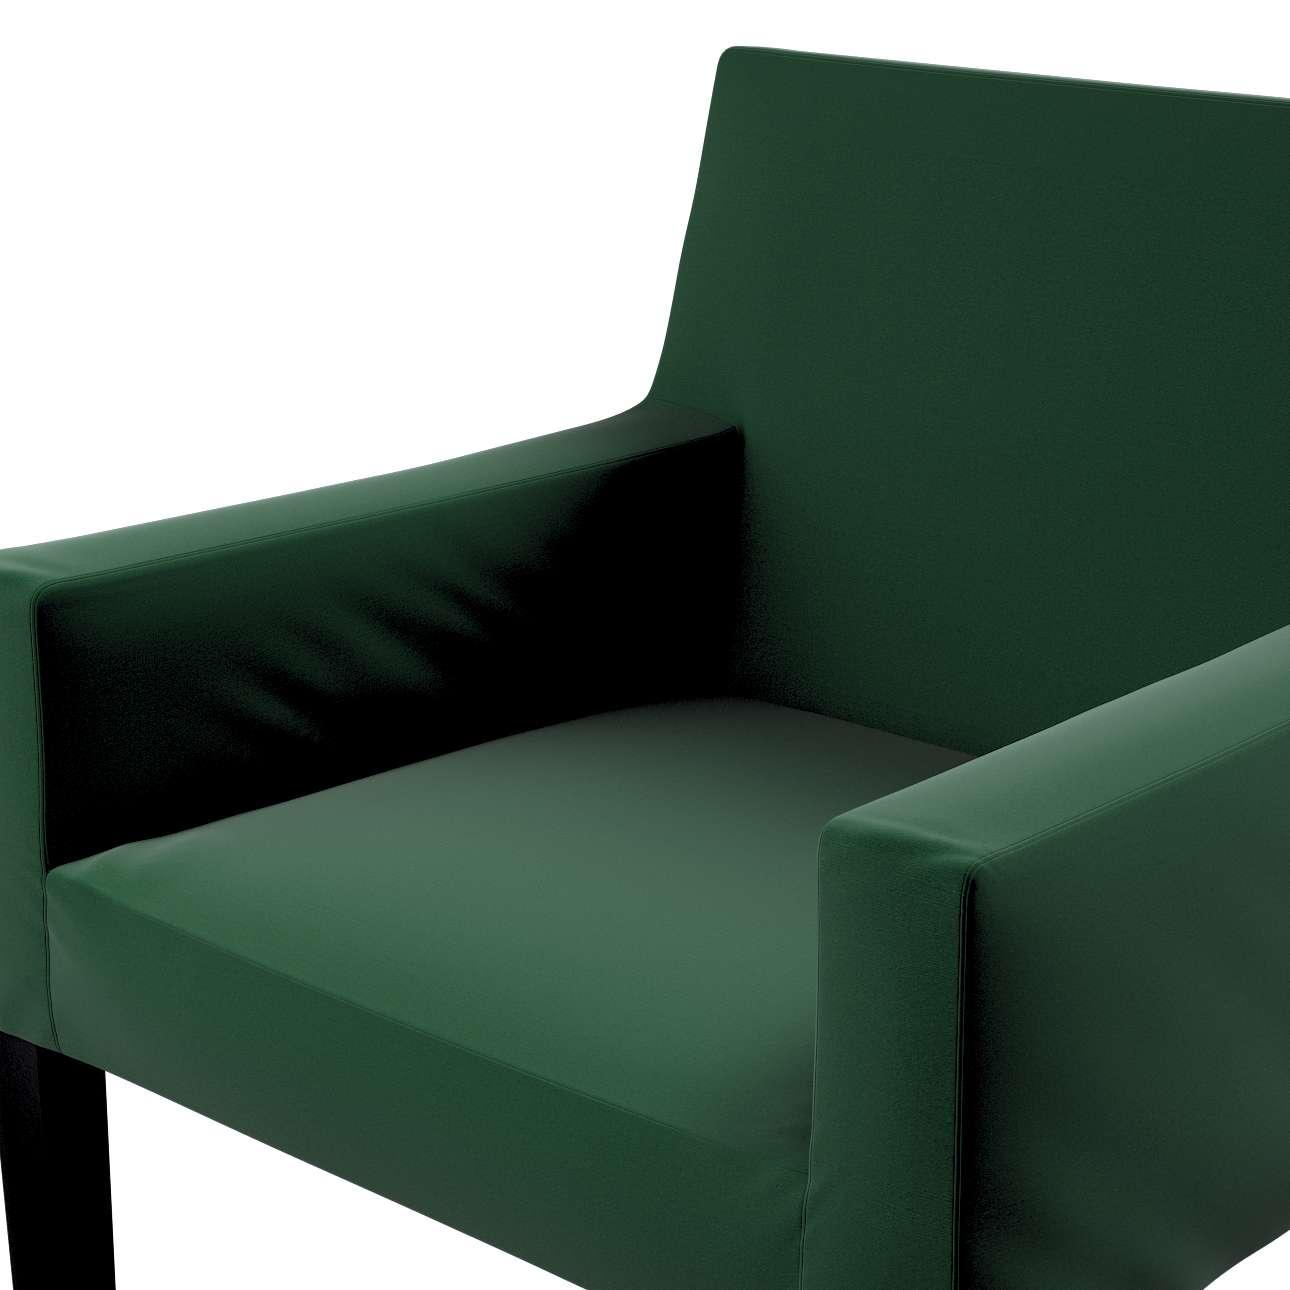 Návlek na stoličku s opierkami Nils V kolekcii Velvet, tkanina: 704-13